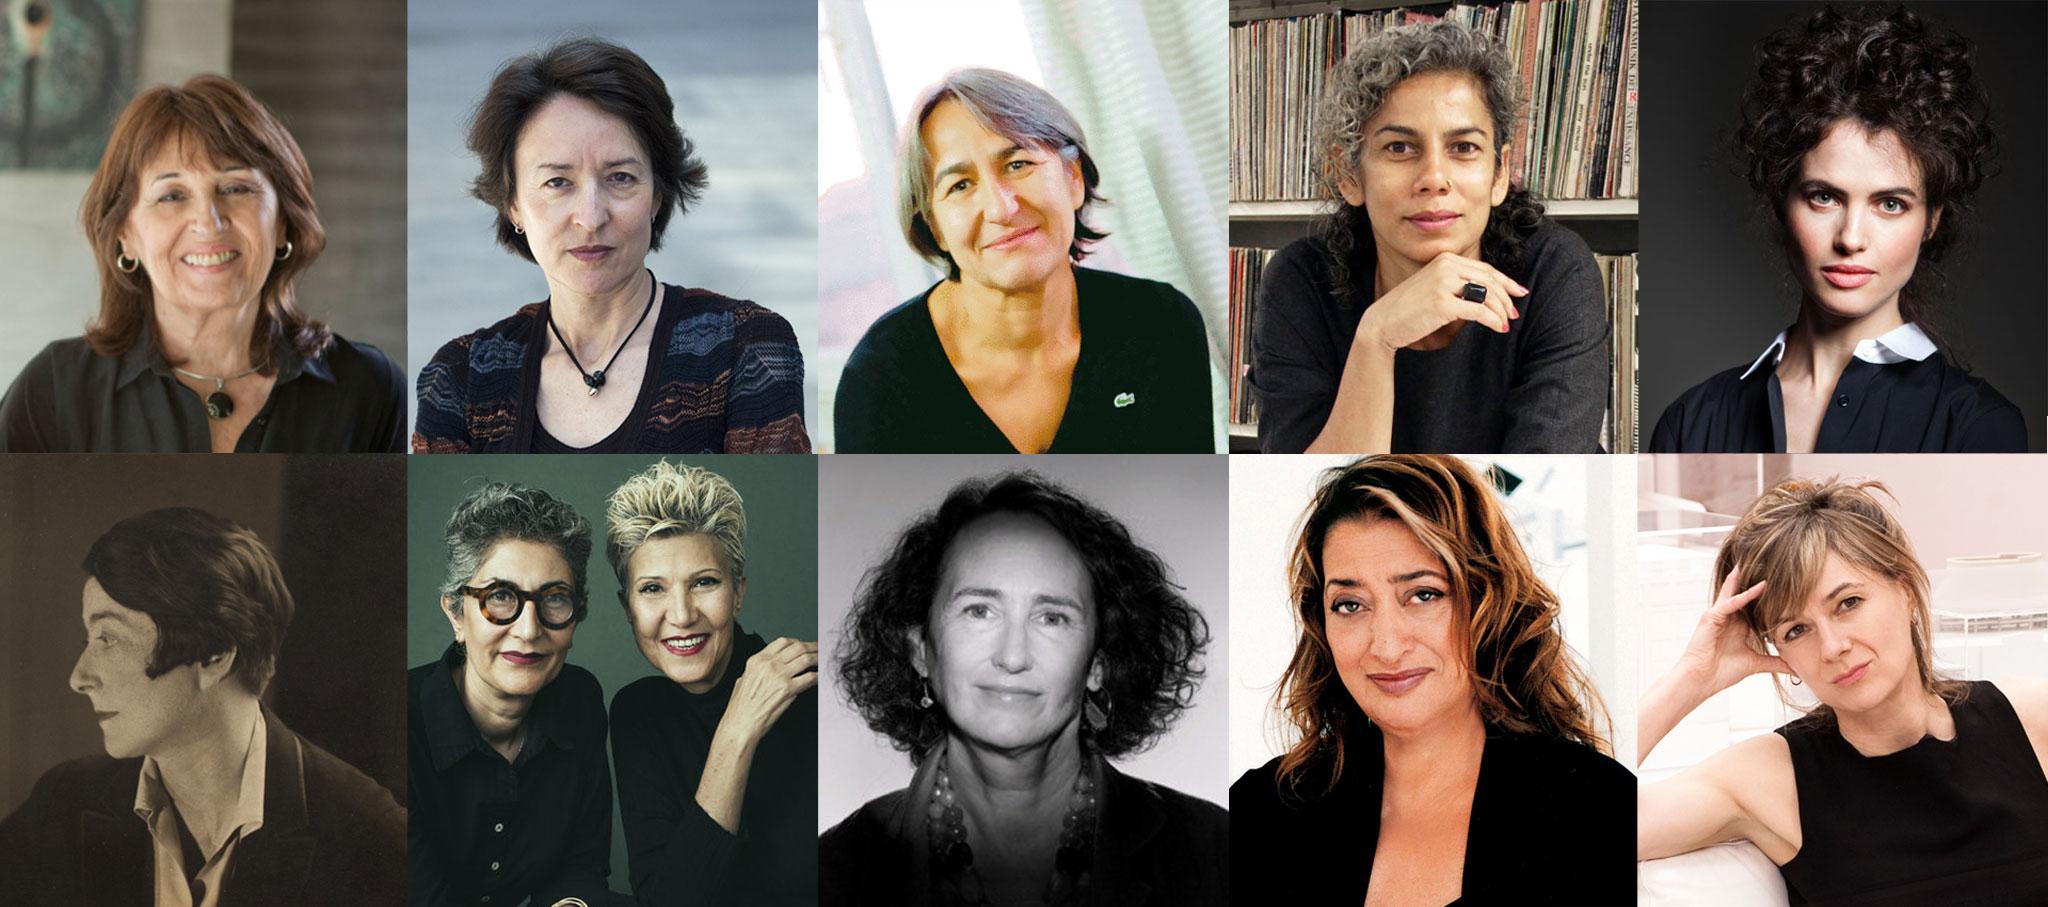 María Victoria Besonías, Ángela García de Paredes, Anne Lacaton, Anupama Kundoo, Neri Oxman, Eileen Gray, Gisue Hariri and Mojgan Hariri, Julia Barfield, Zaha Hadid, Amanda Levete